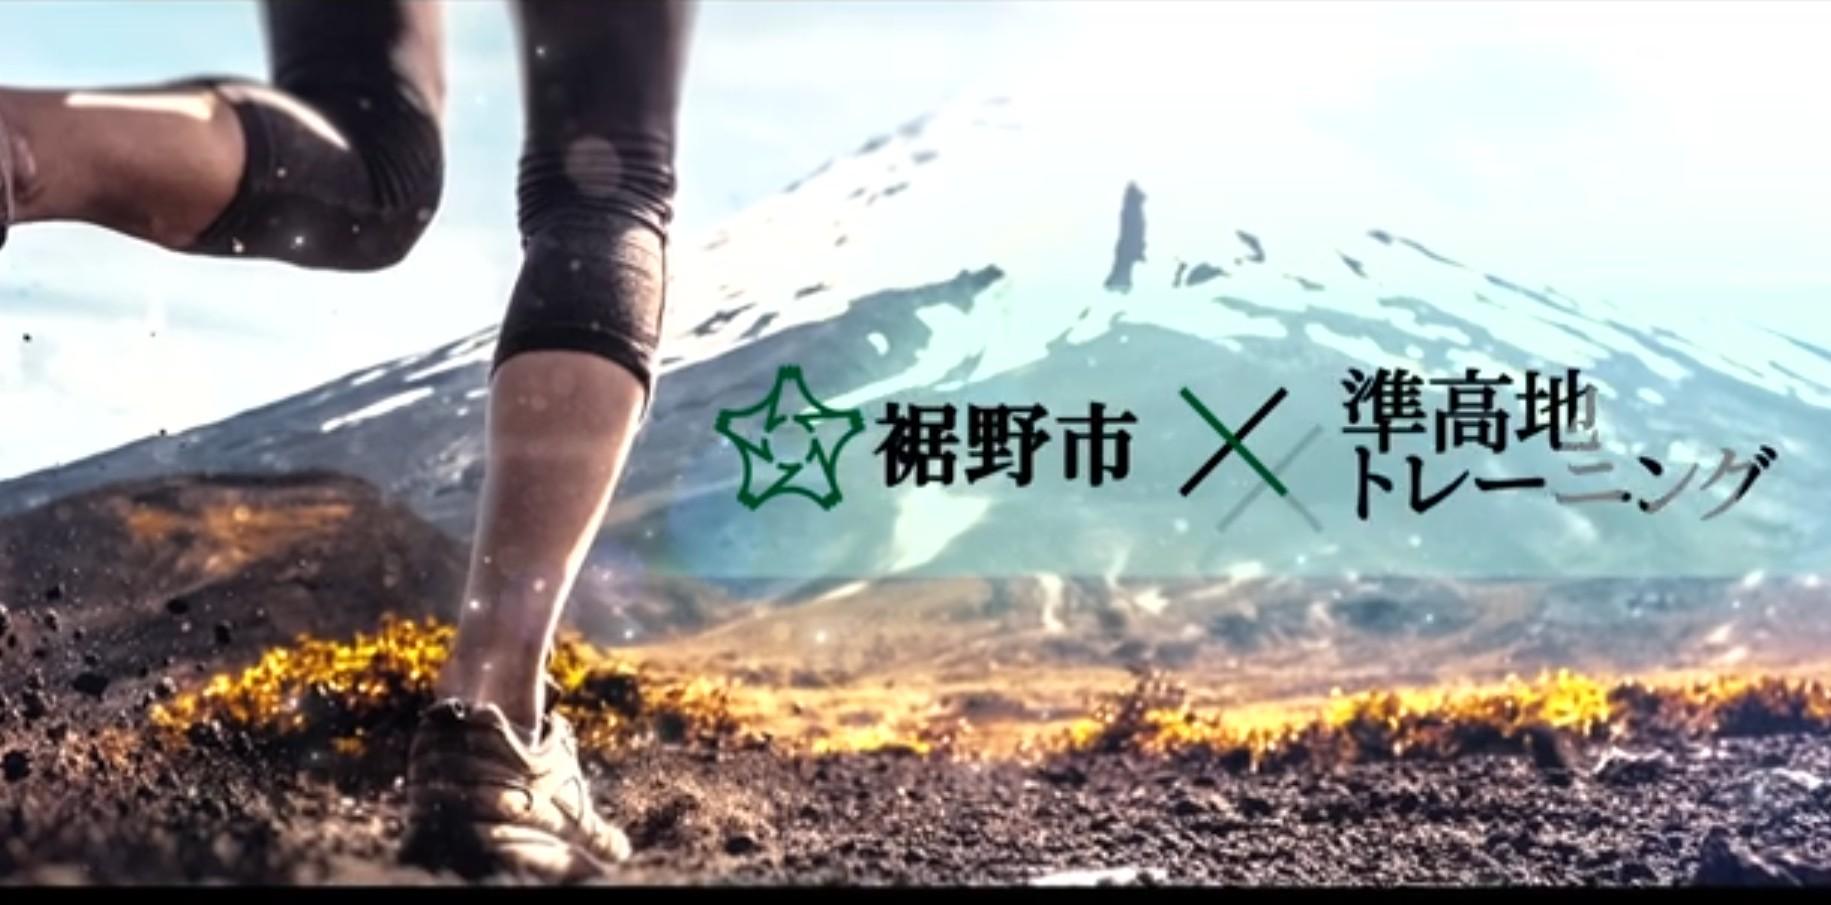 スポーツ合宿誘致PR動画完成!